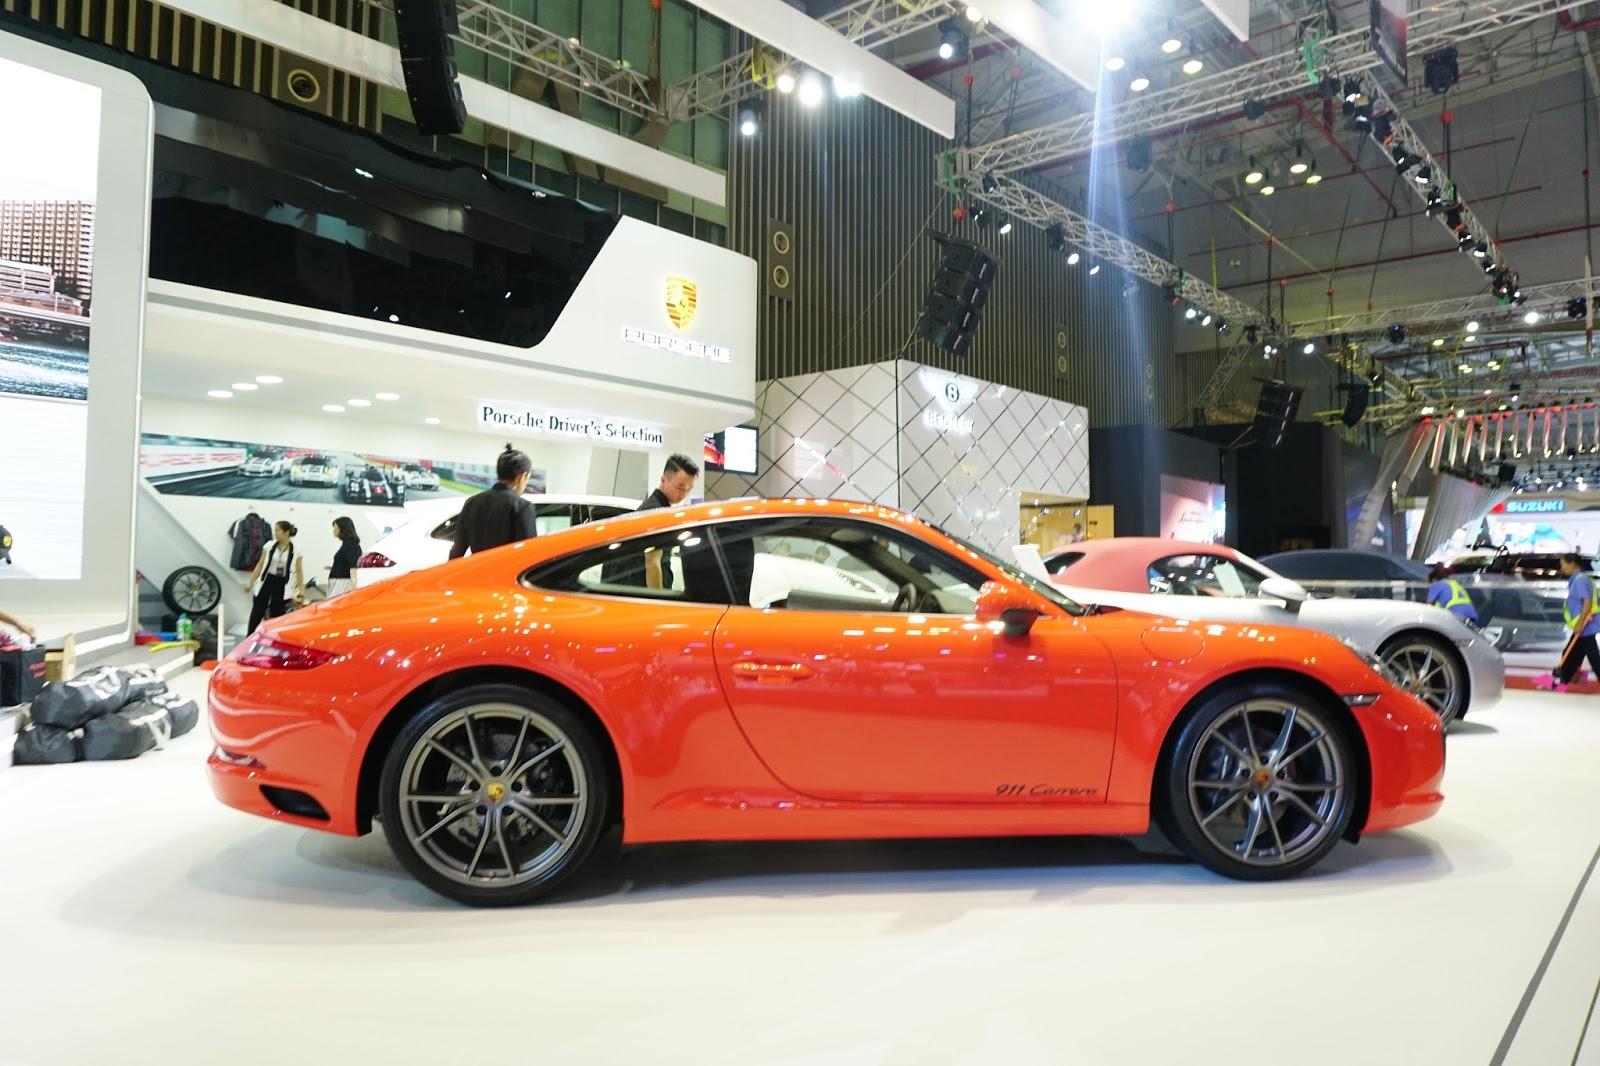 Porsche 911 Carrera tỏa sáng tại gian hàng của Porsche